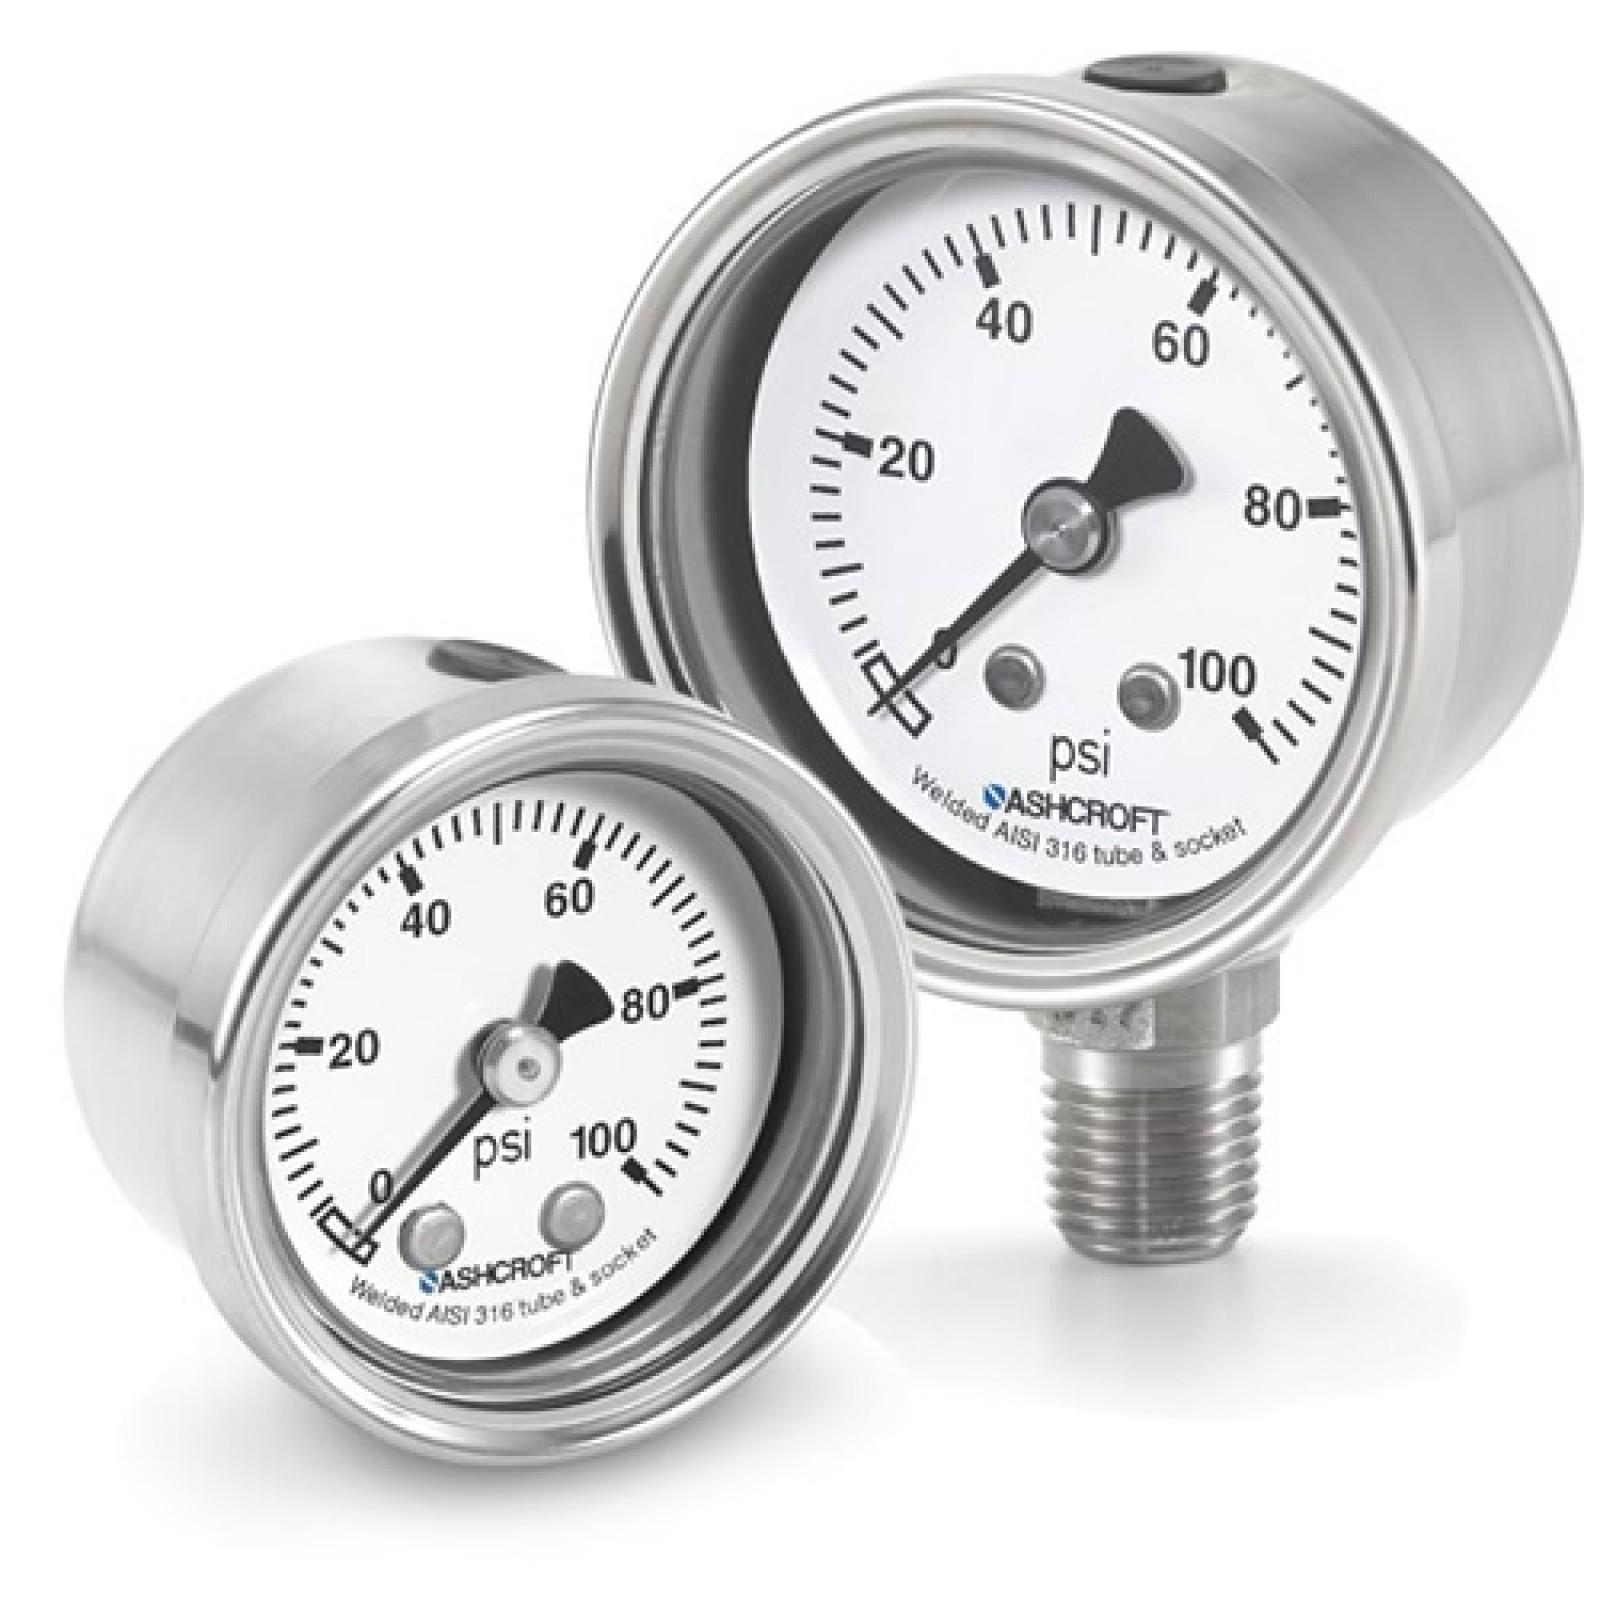 "63 1008S 02B XLL 1000#/KP - Pressure Gauge, 63mm stainless 1/4"" NPT Back conn & Case, Plus Performance, 30""hg/60 psi"